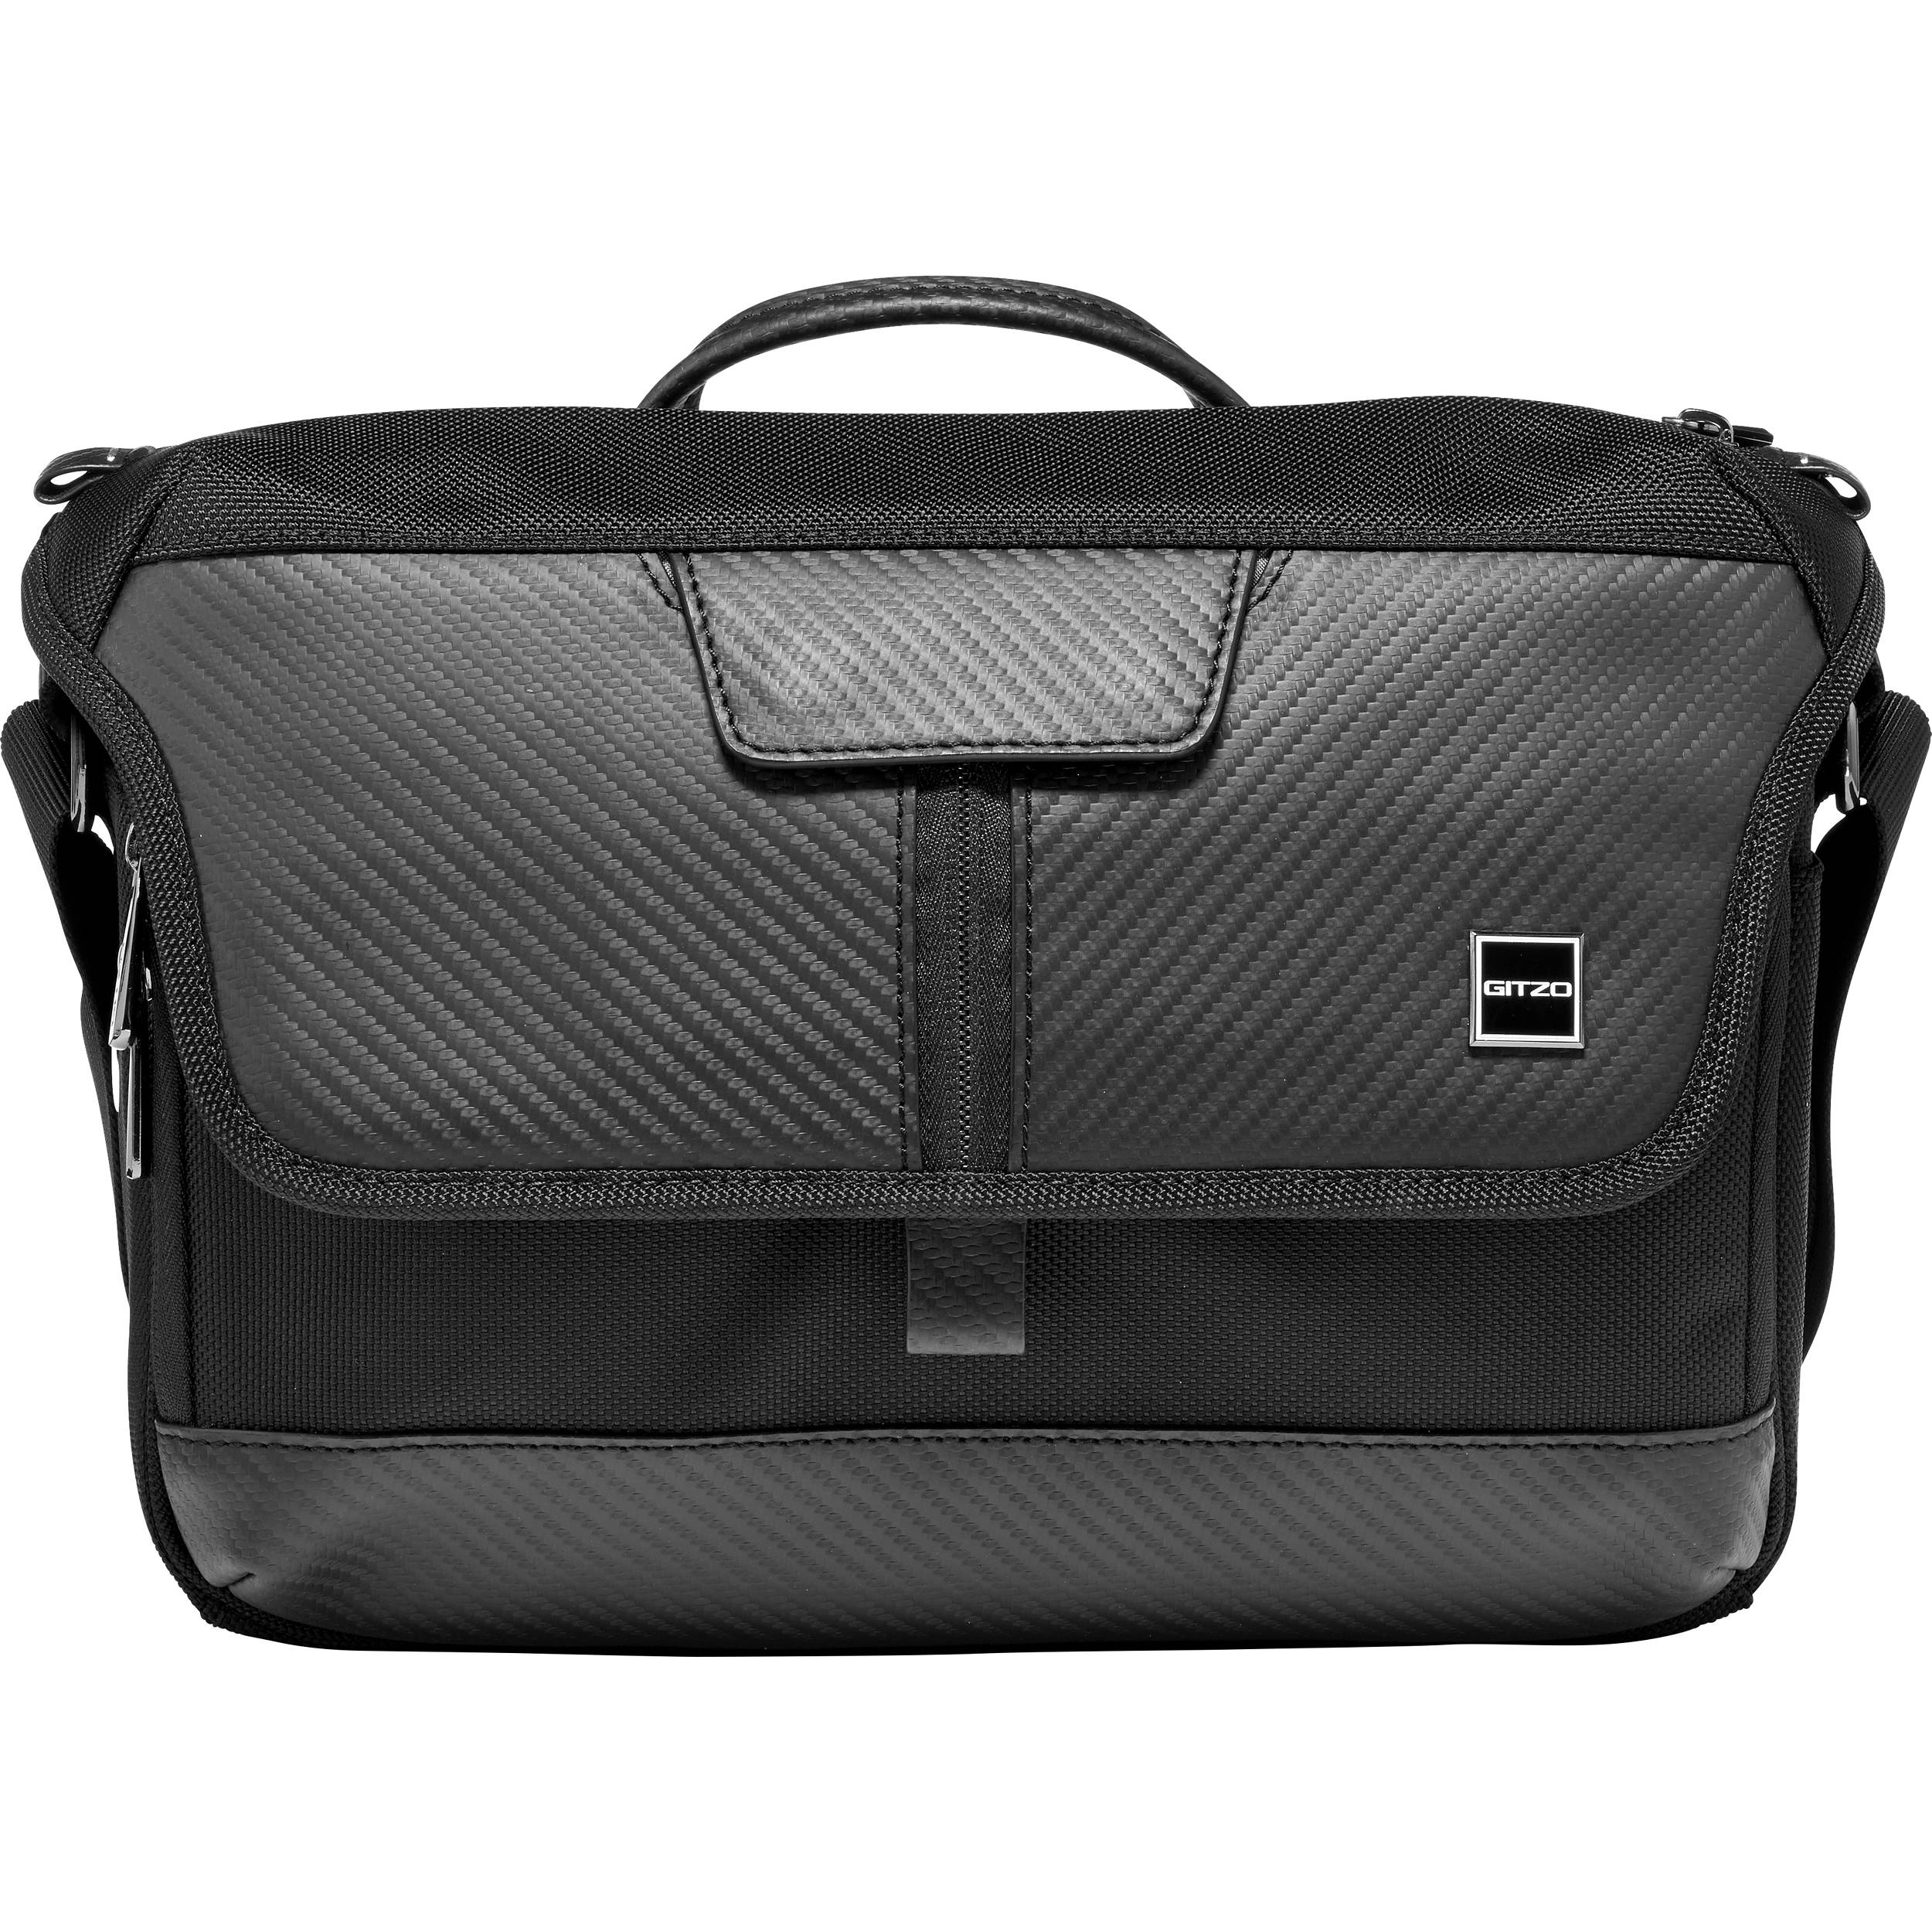 Gitzo Century Camera Compact Messenger Bag Black